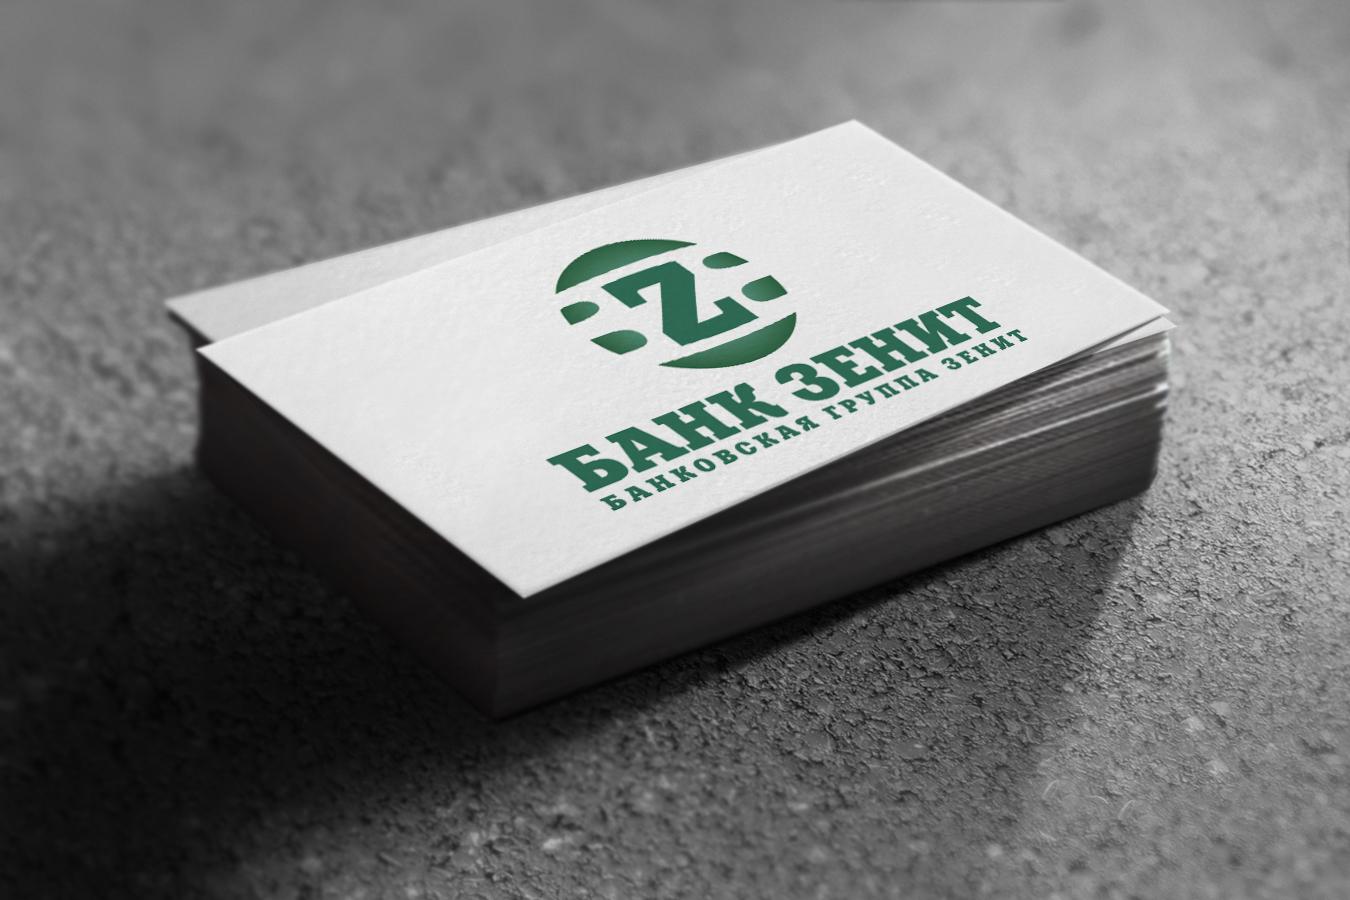 Разработка логотипа для Банка ЗЕНИТ фото f_9055b4c7dc96c67b.jpg